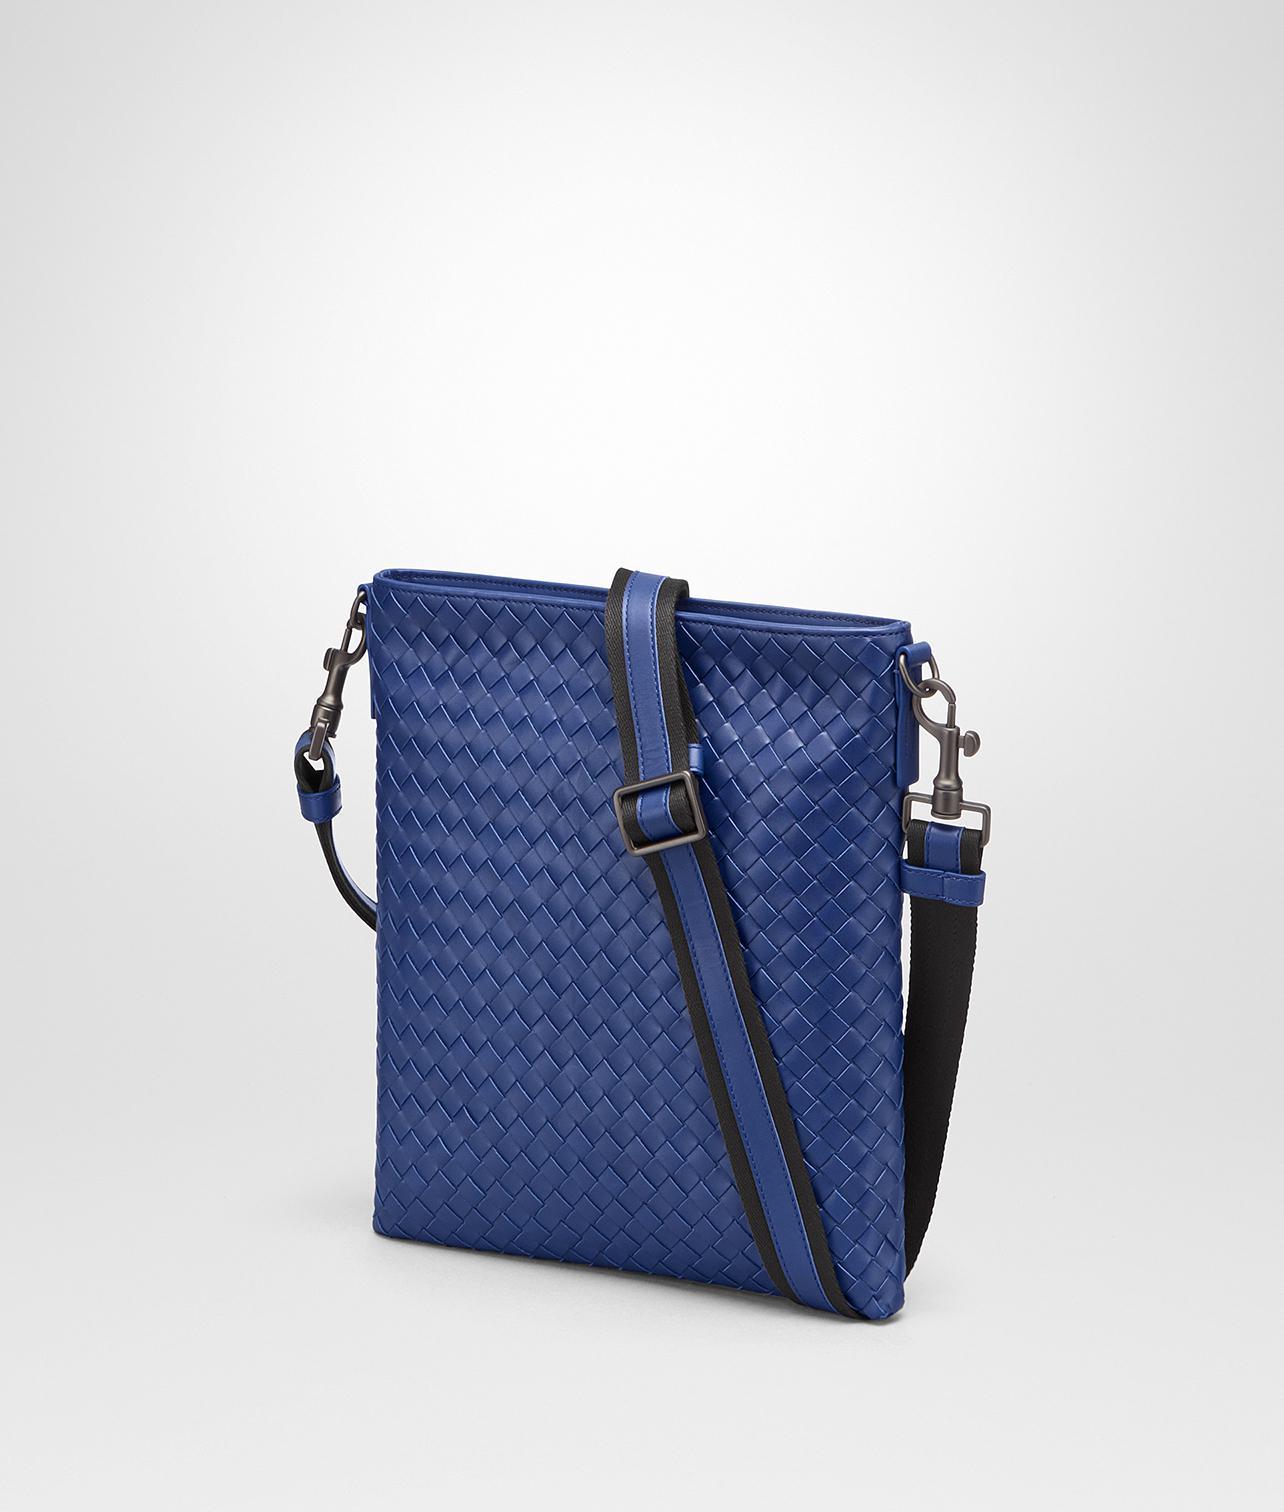 7d0db6e810 Bottega Veneta Cobalt Blue Intrecciato Small Messenger Bag in Blue ...